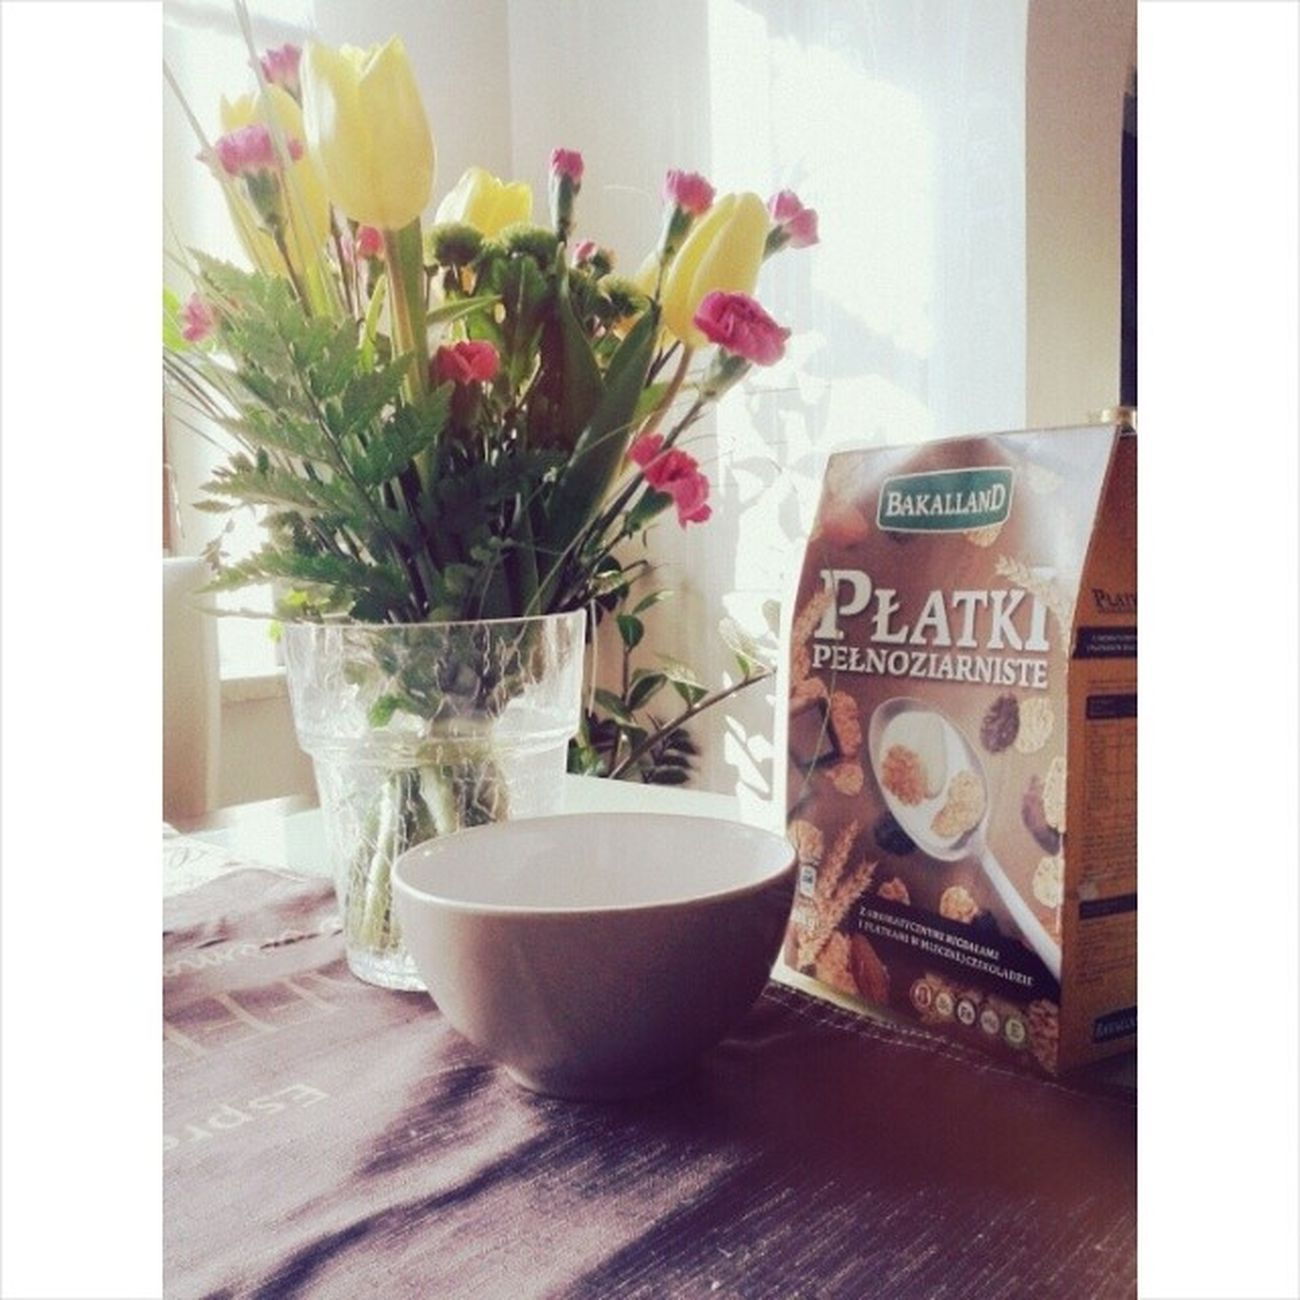 Good Morning Sunshine Breakfast Śniadanie Beautiful Day Photo Polishgirl Poland Morn Sun Flowers Bakalland Love Photooftheday